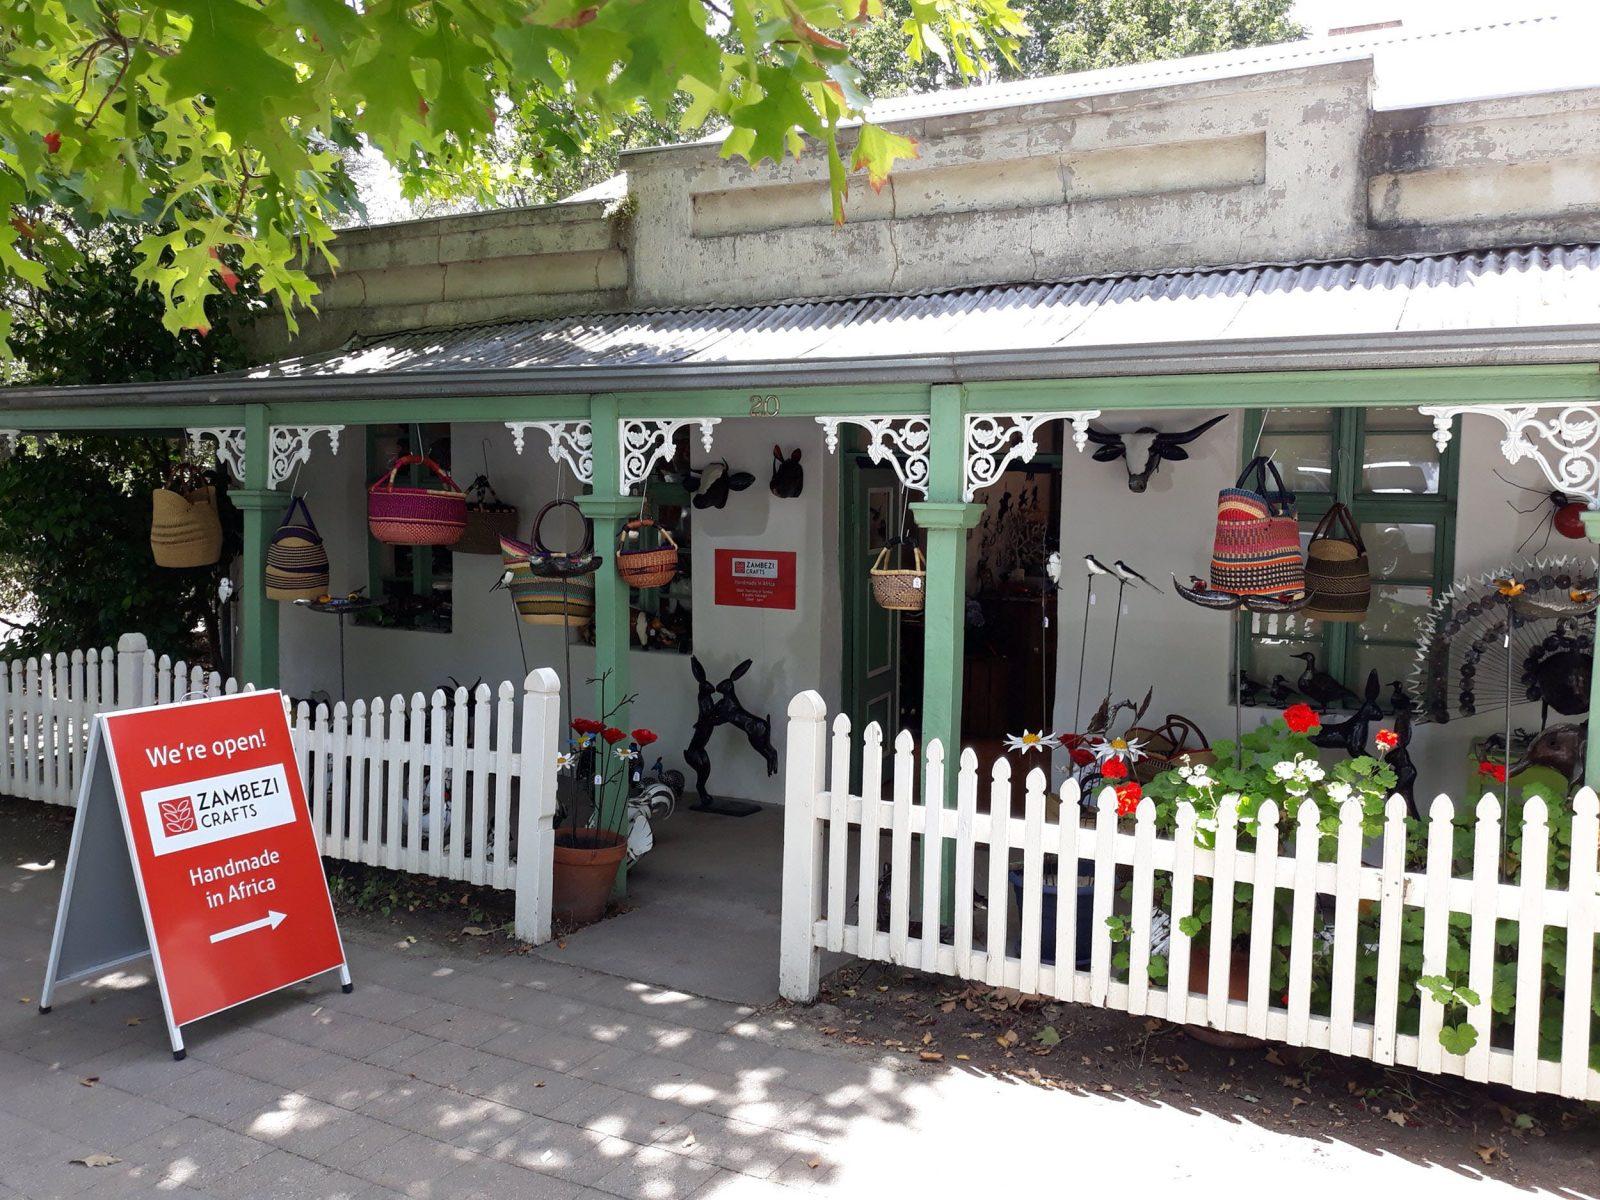 Zambezi Crafts' shop in Hahndorf